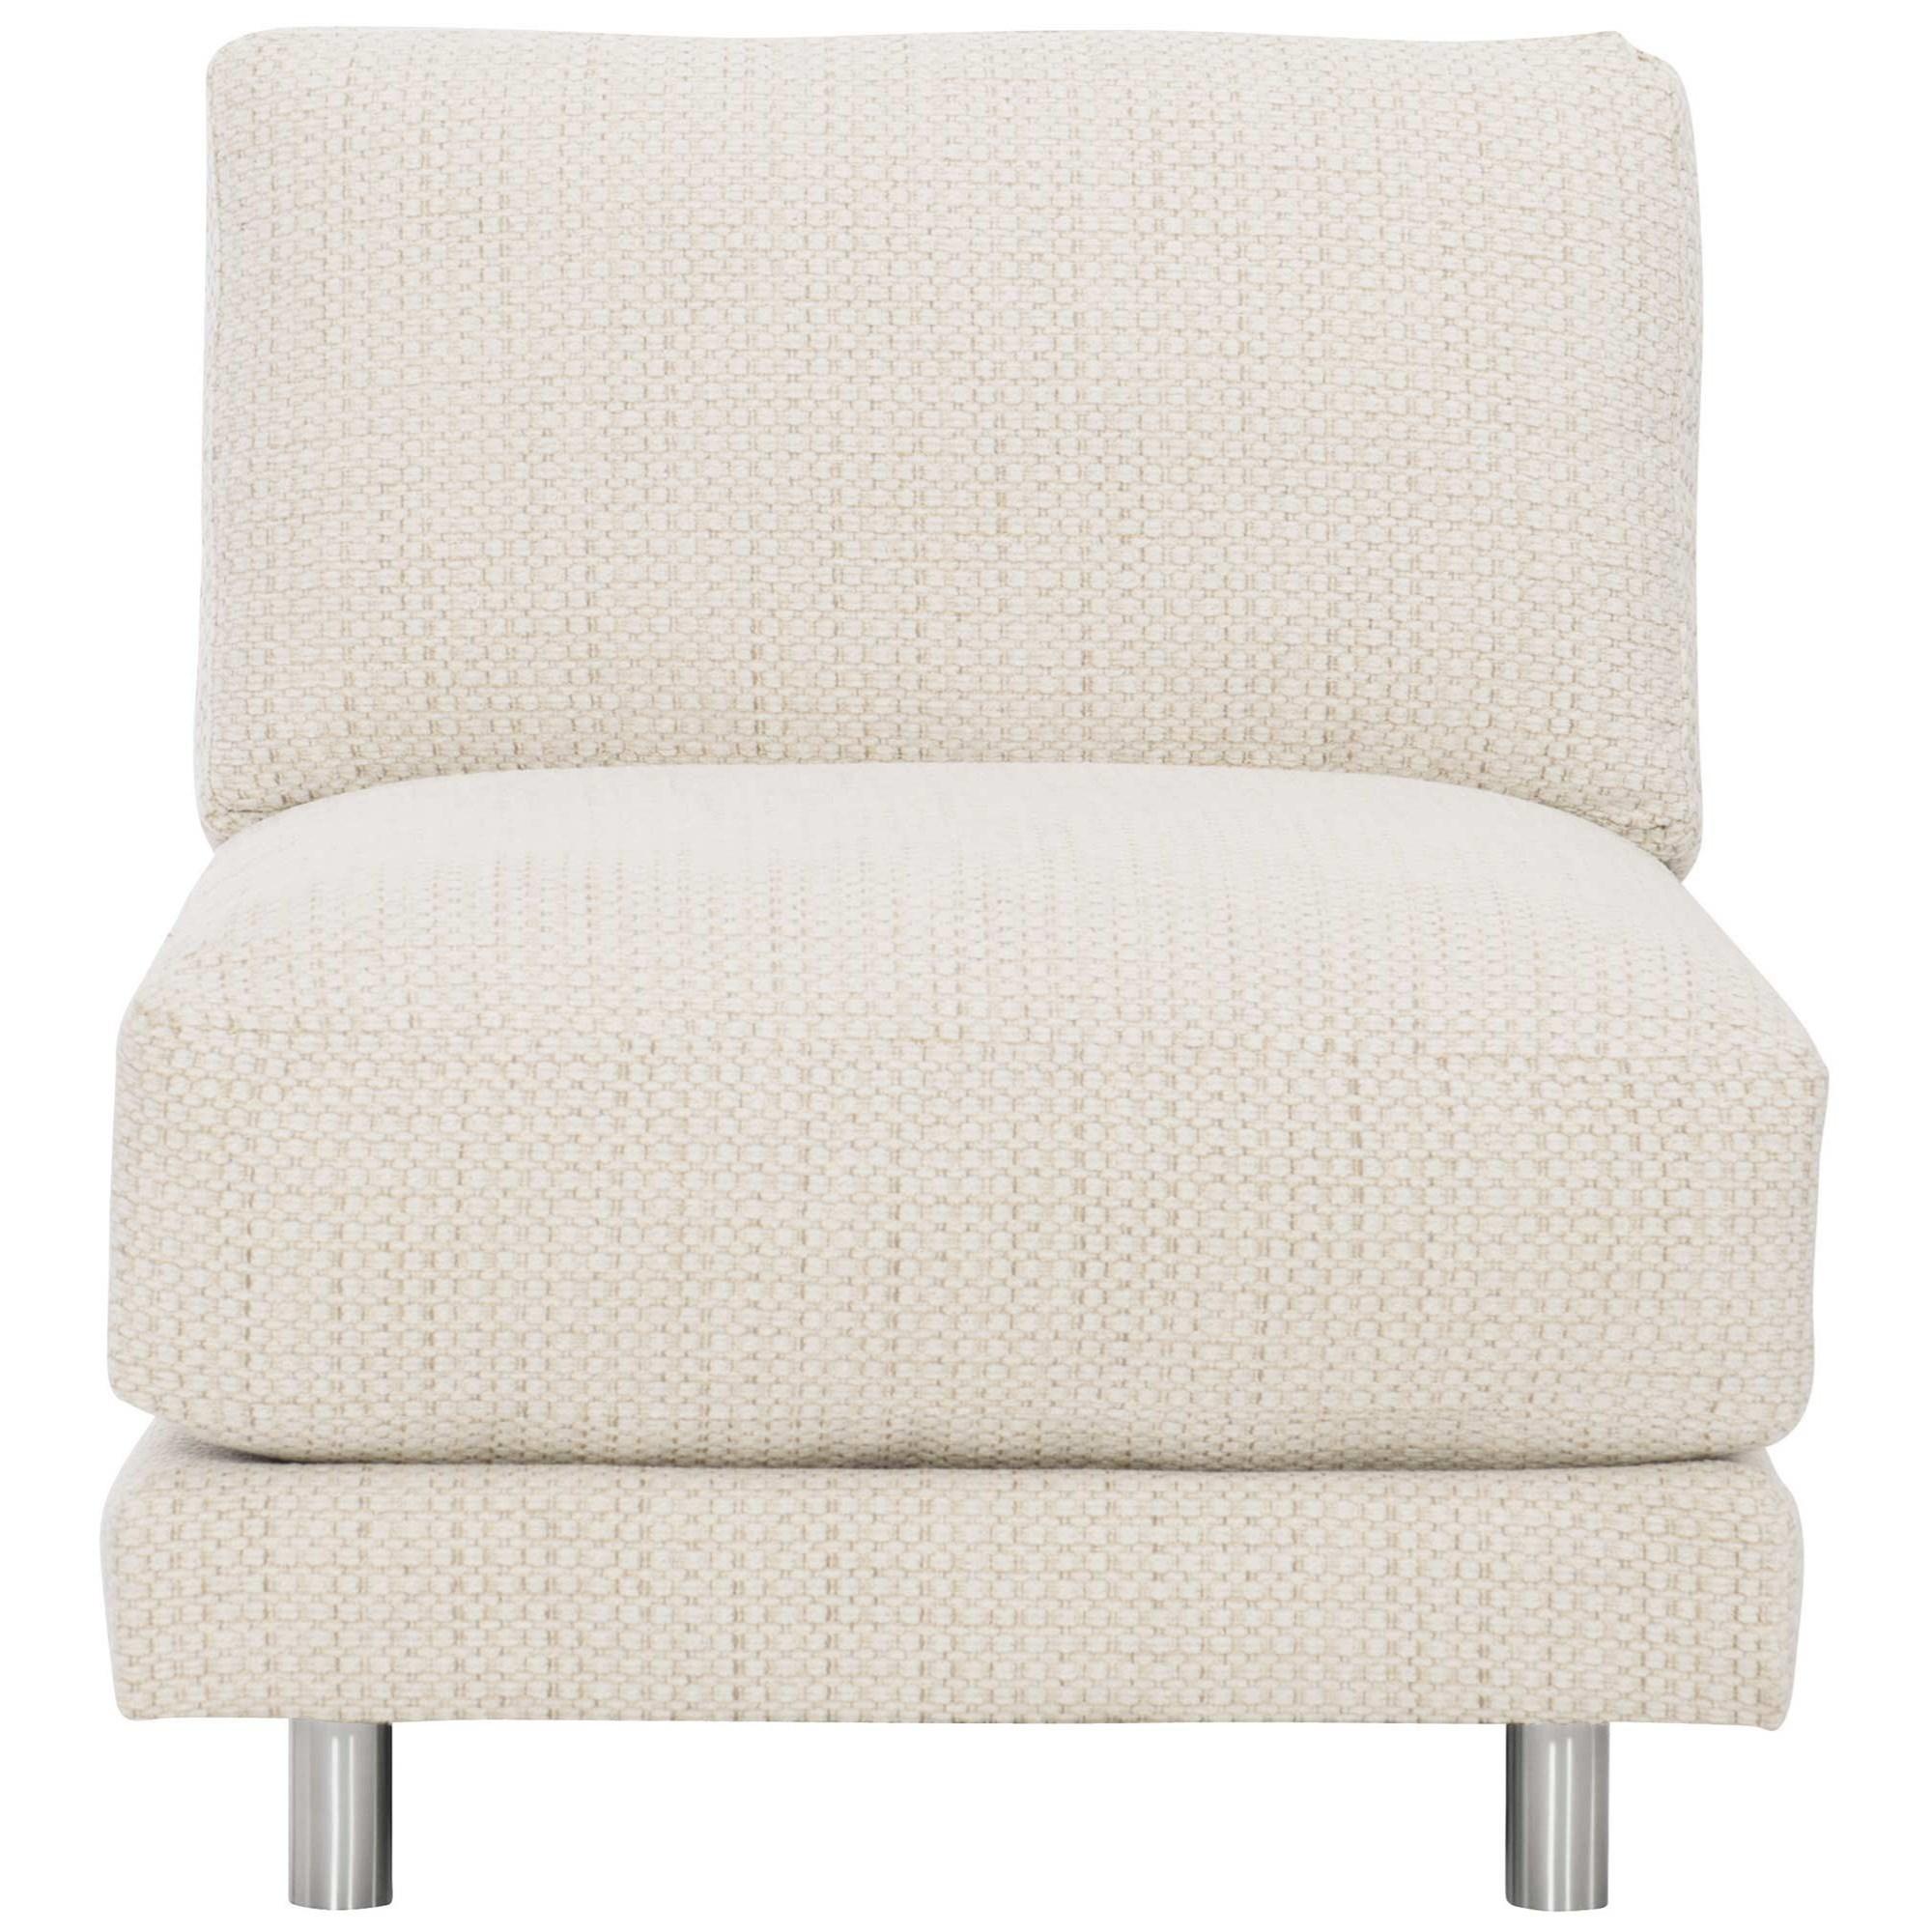 Exteriors - Avanni Armless Chair at Williams & Kay